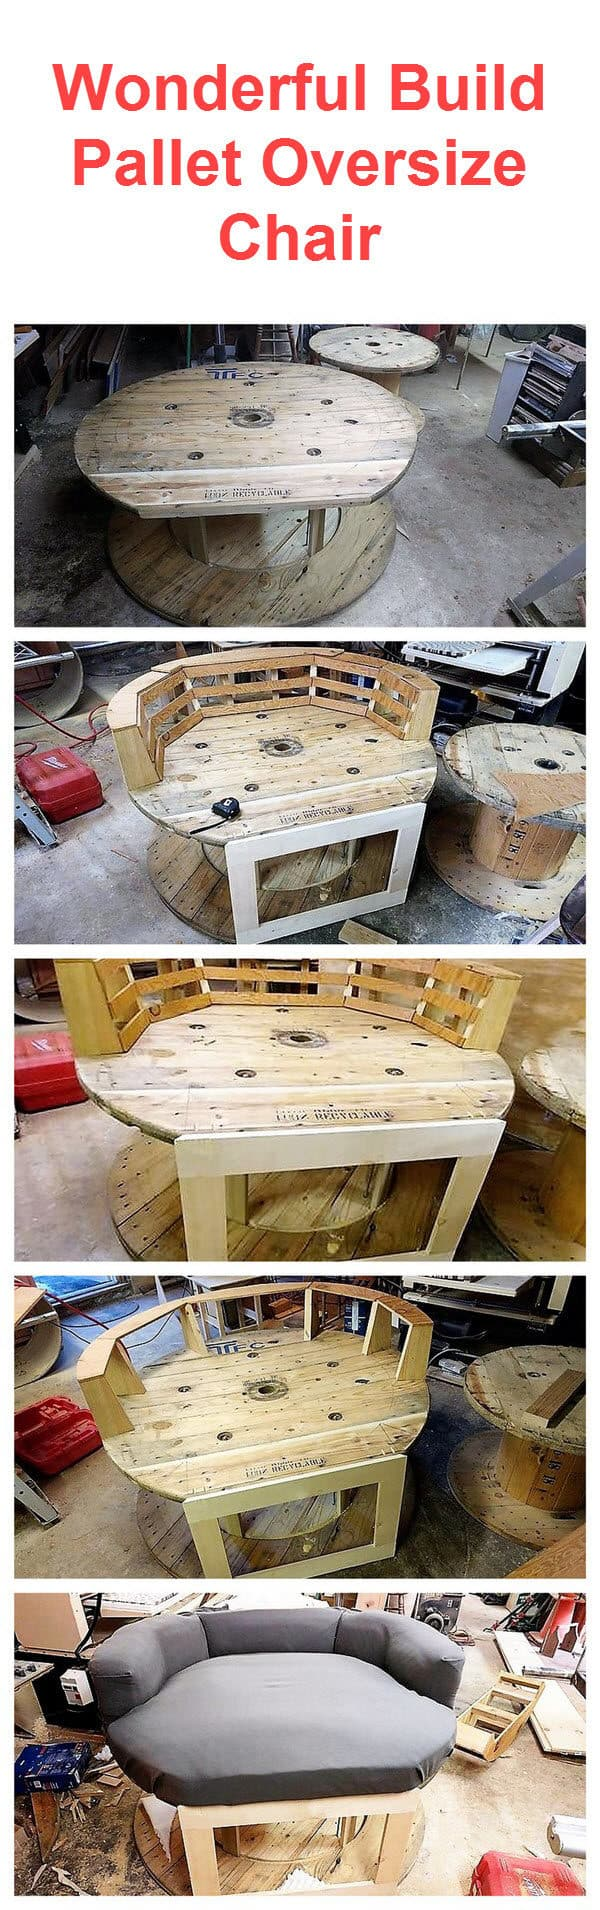 DIY Pallet Oversize Chair